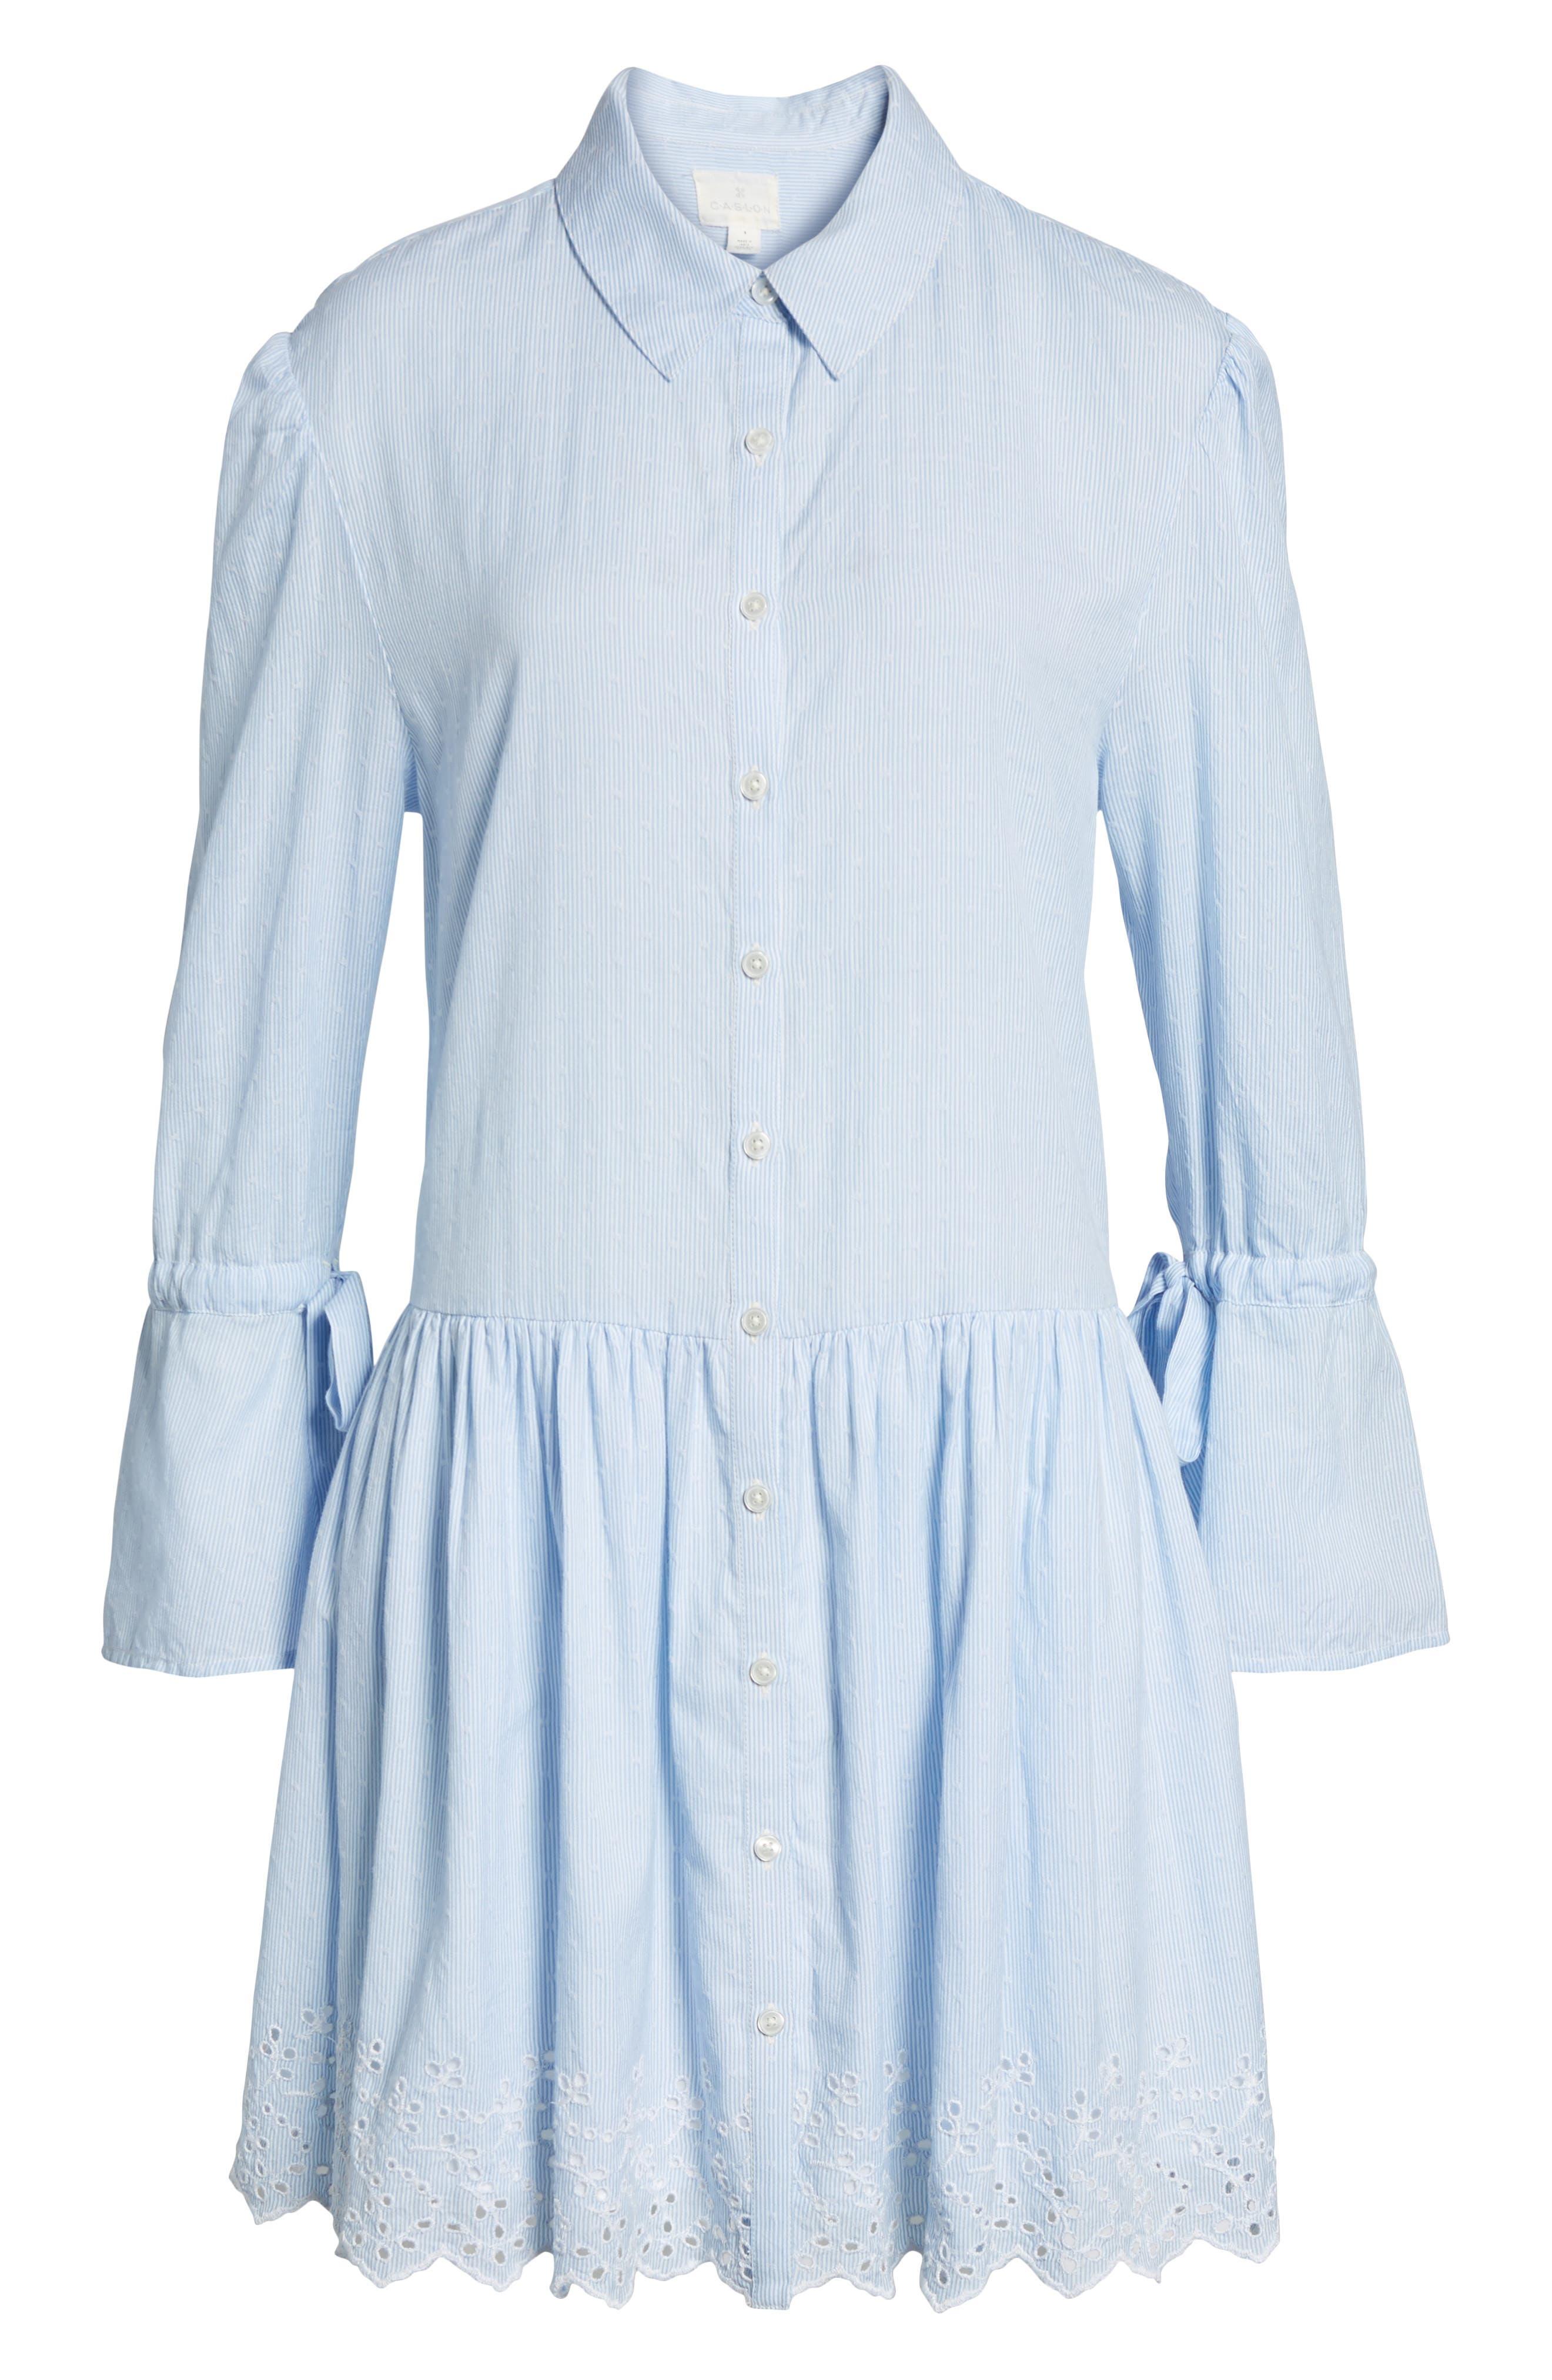 Pinstripe Eyelet Trim Cotton Shirtdress,                             Alternate thumbnail 6, color,                             Blue- White Stripe